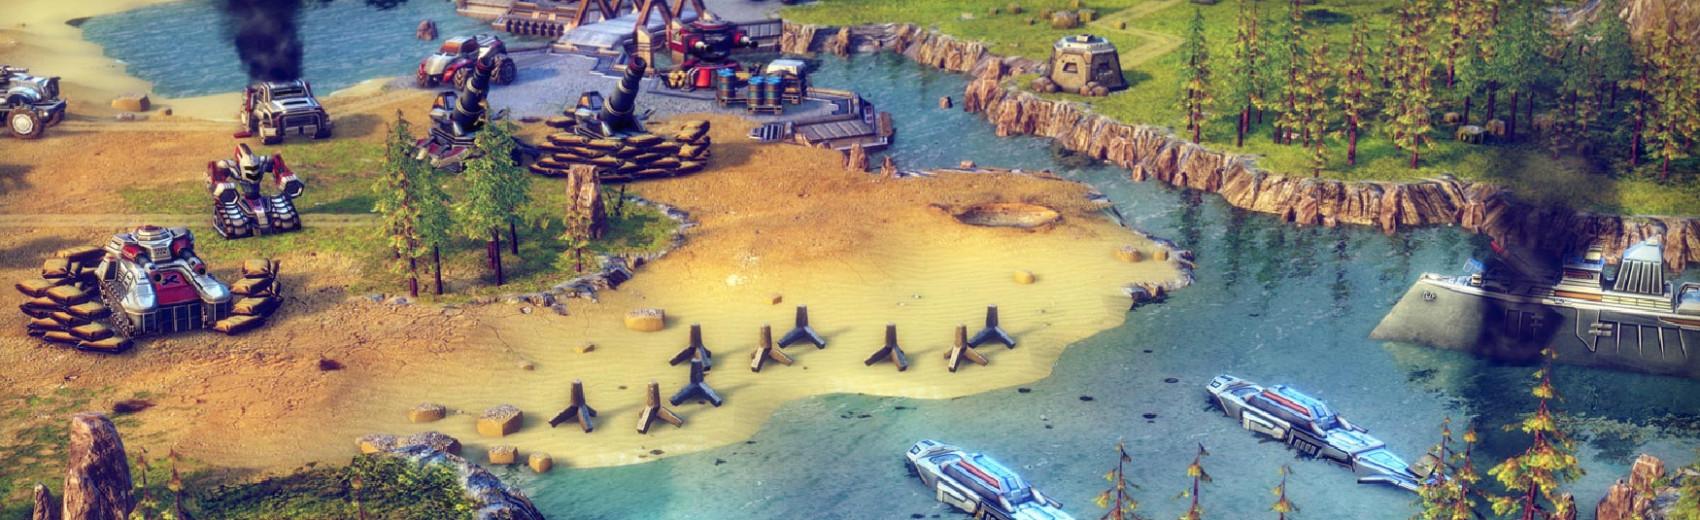 KING Art Games - Buy Battle Worlds: Kronos